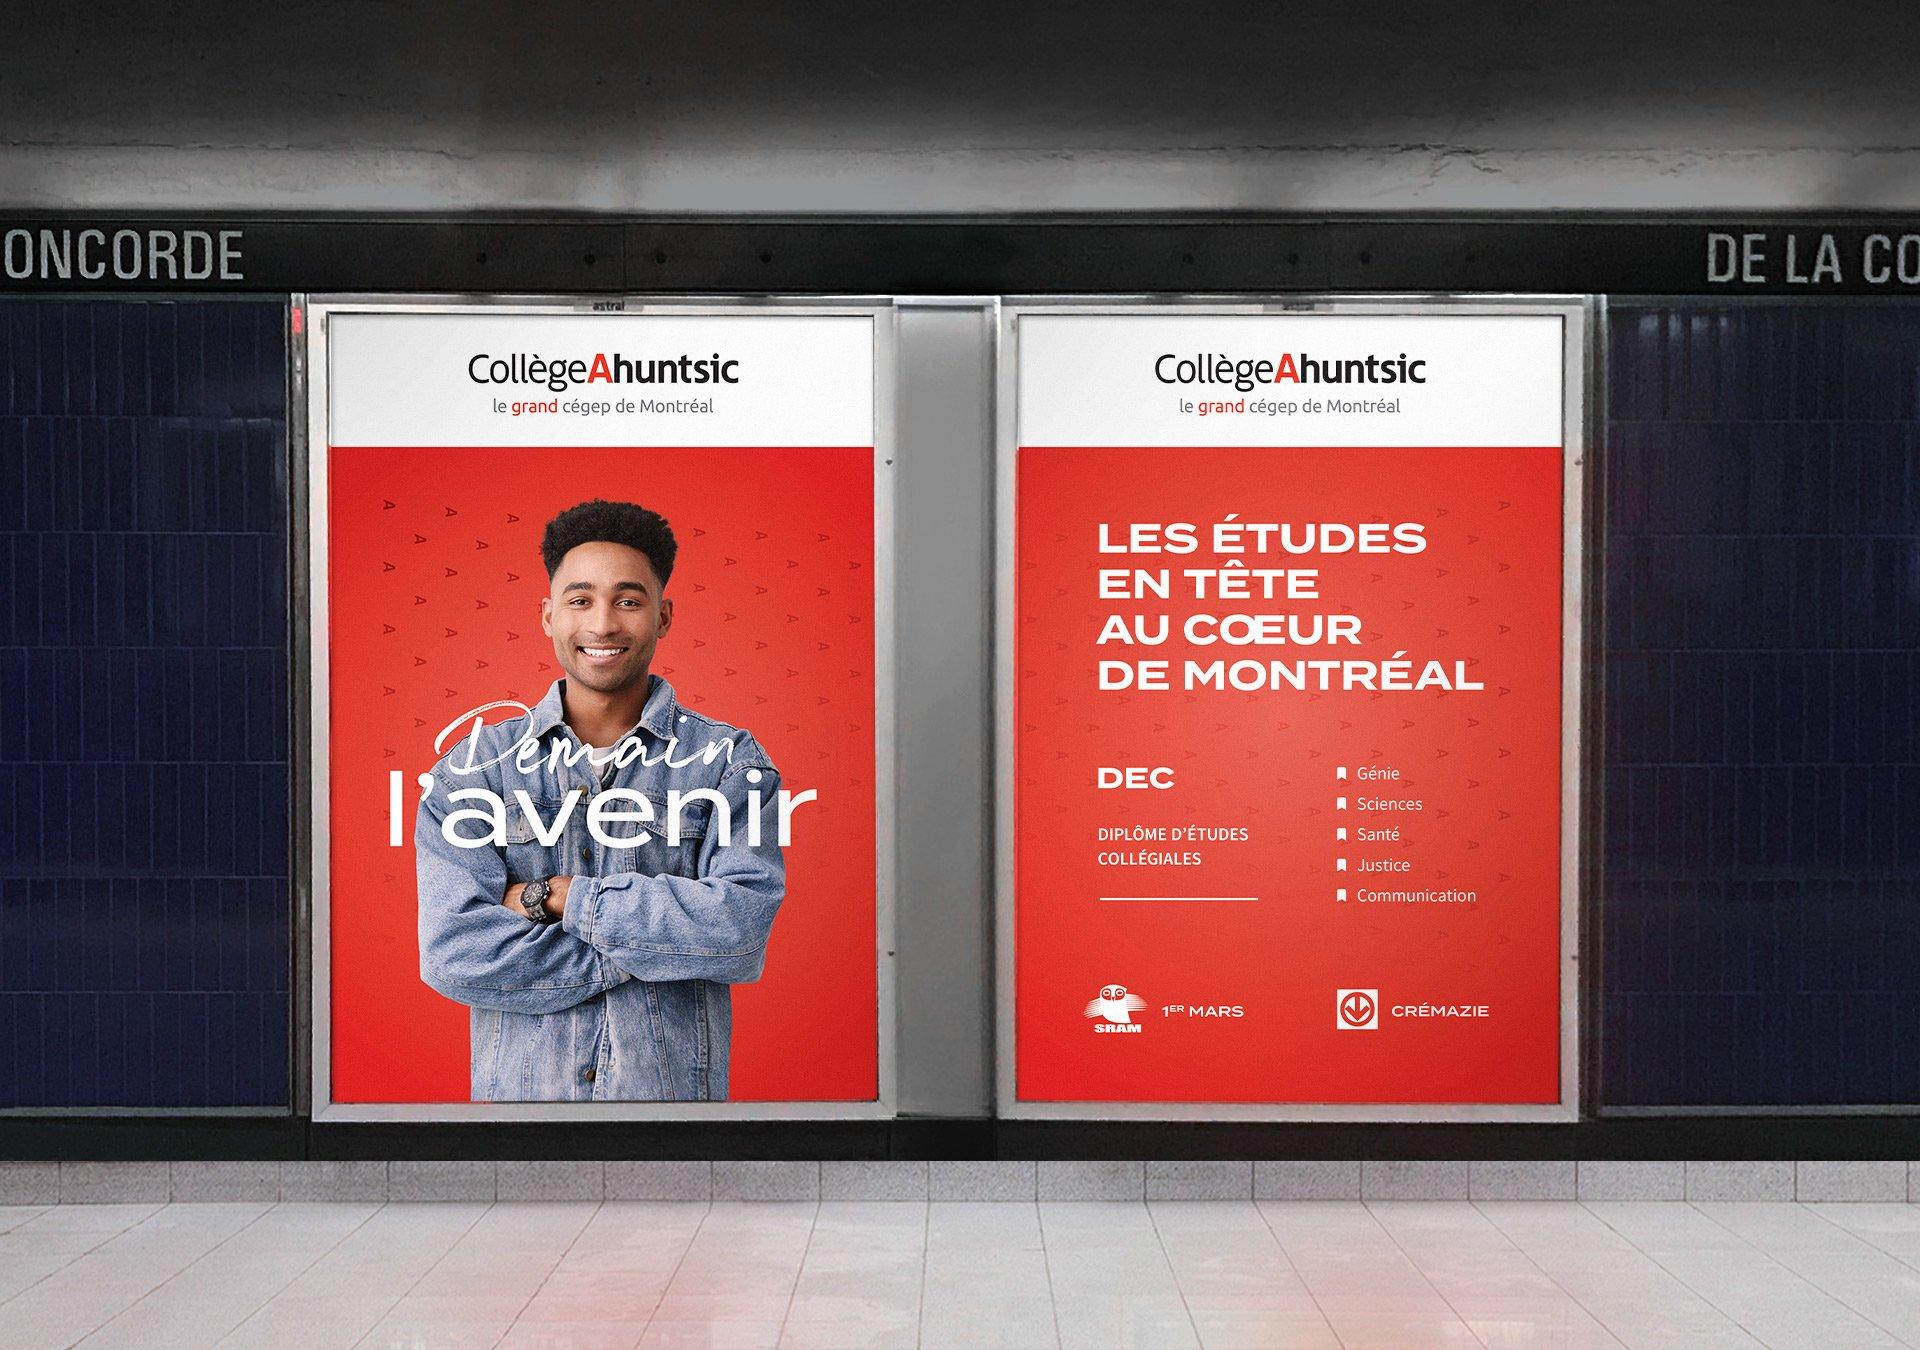 Lumiquai - Campagne Publicitaire - Demain l'avenir - Collège Ahuntsic